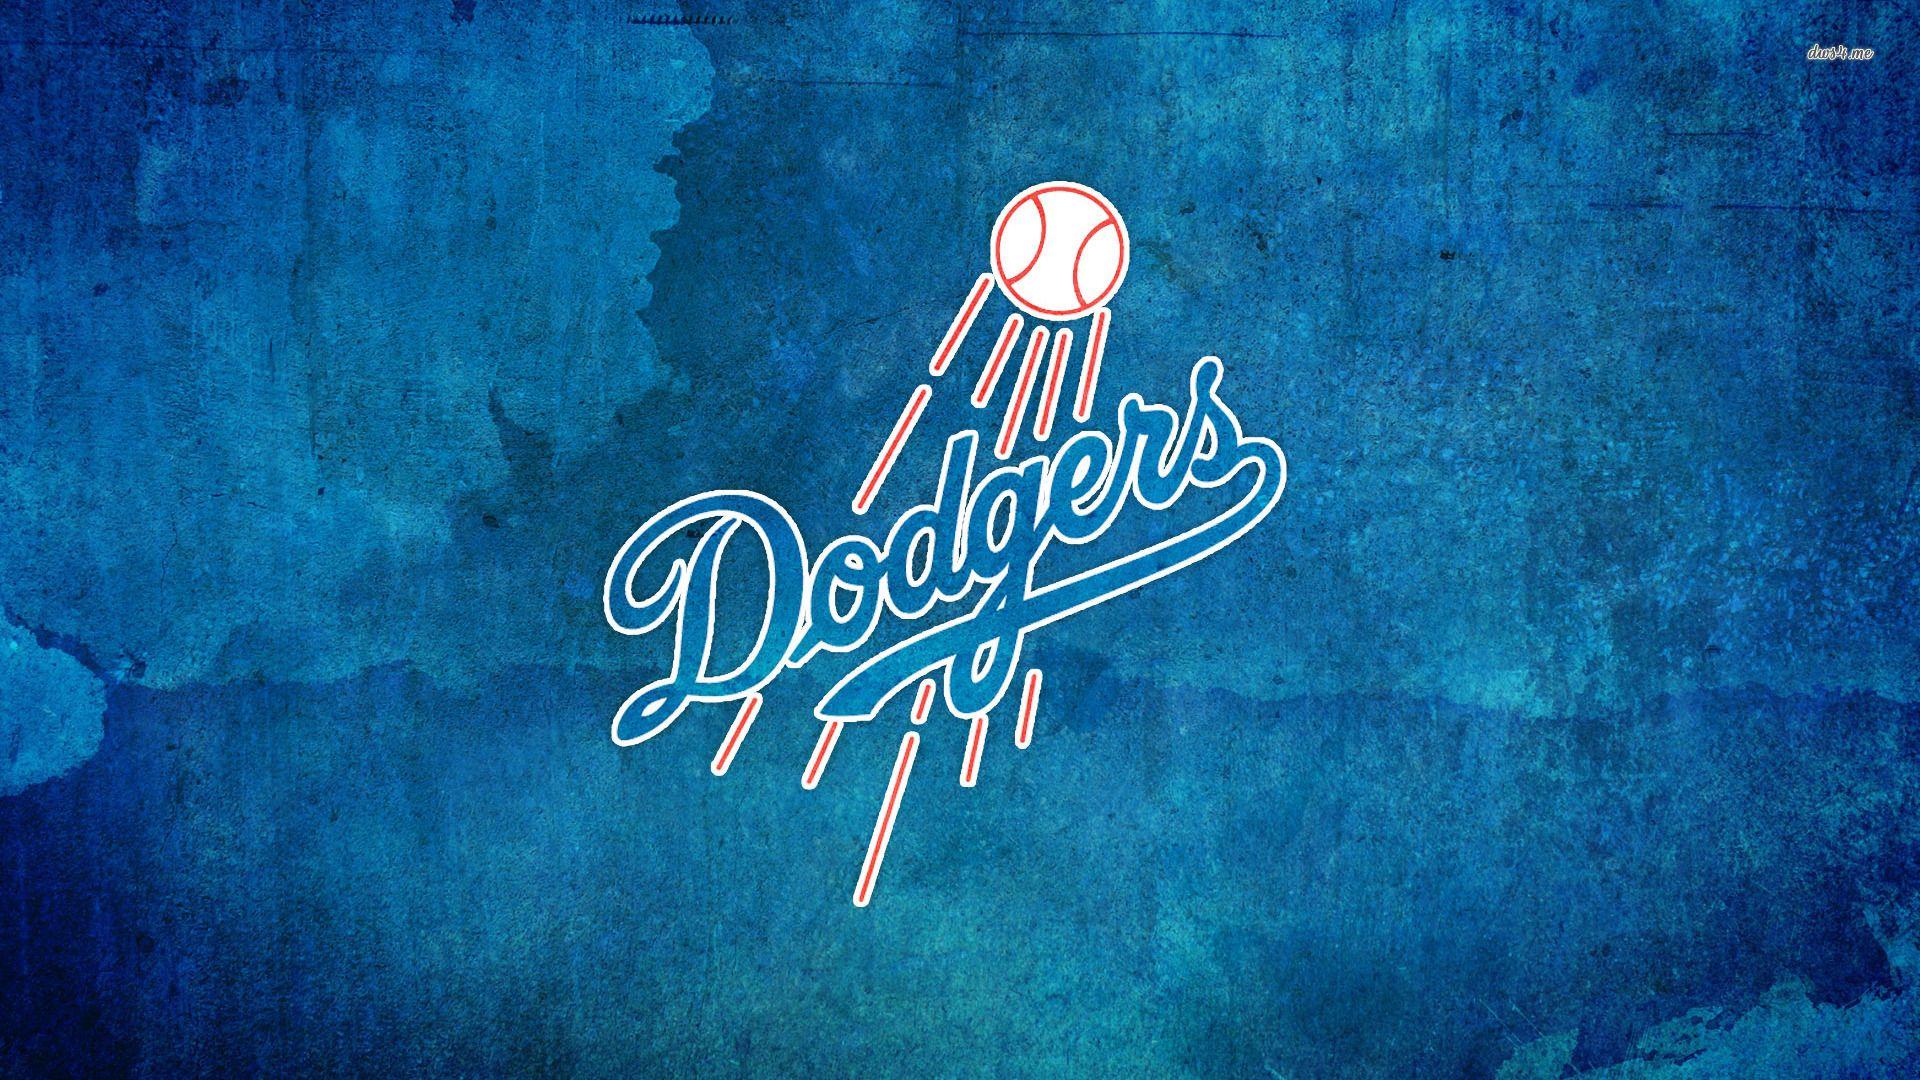 Dodgers Good Wallpaper